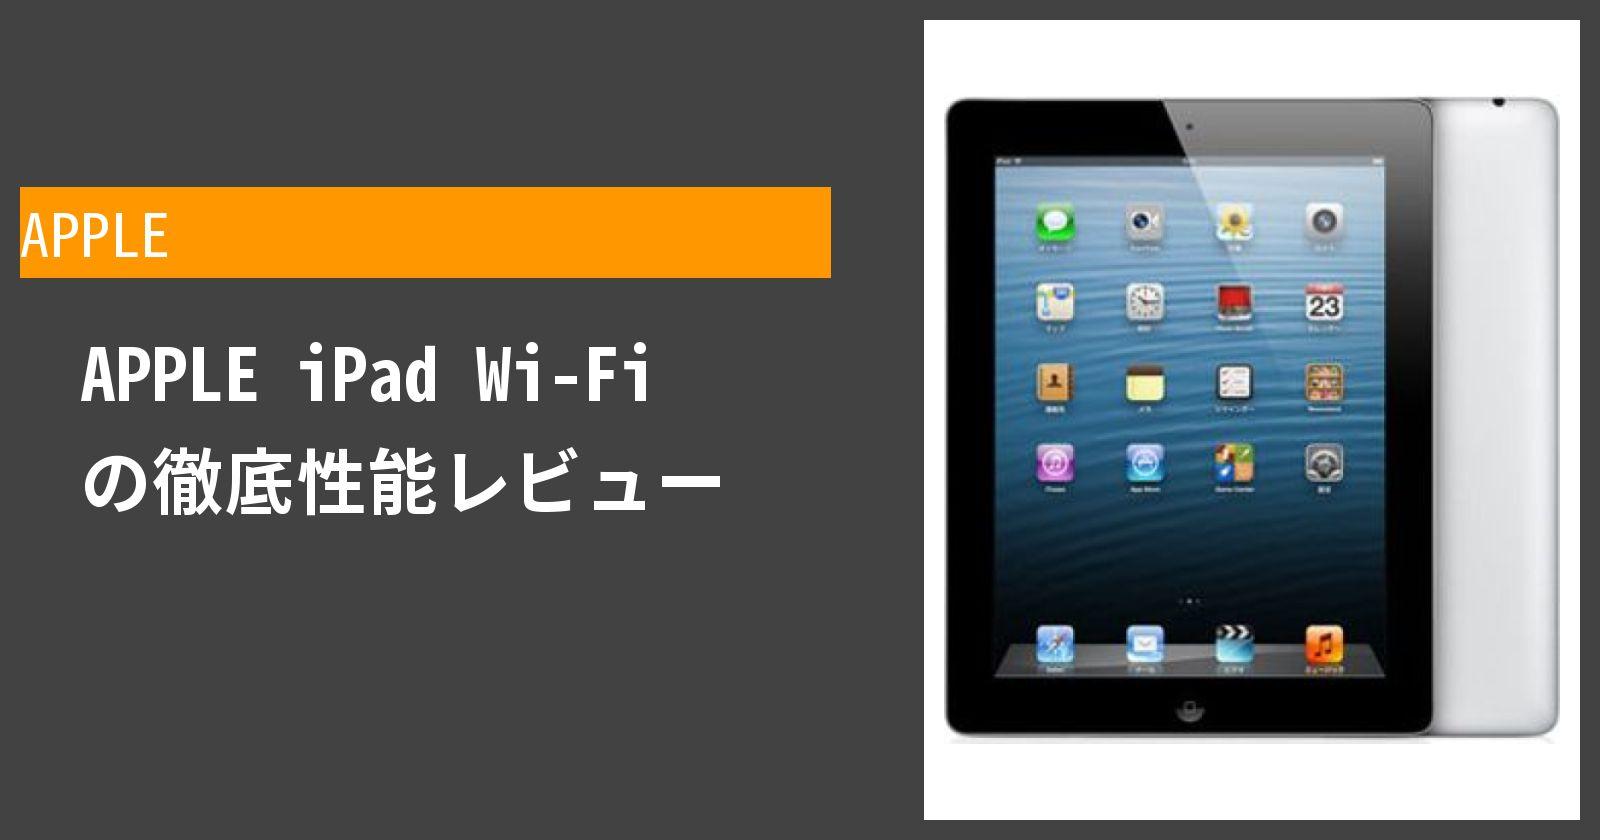 iPad 第4世代 Wi-Fi の徹底性能レビュー